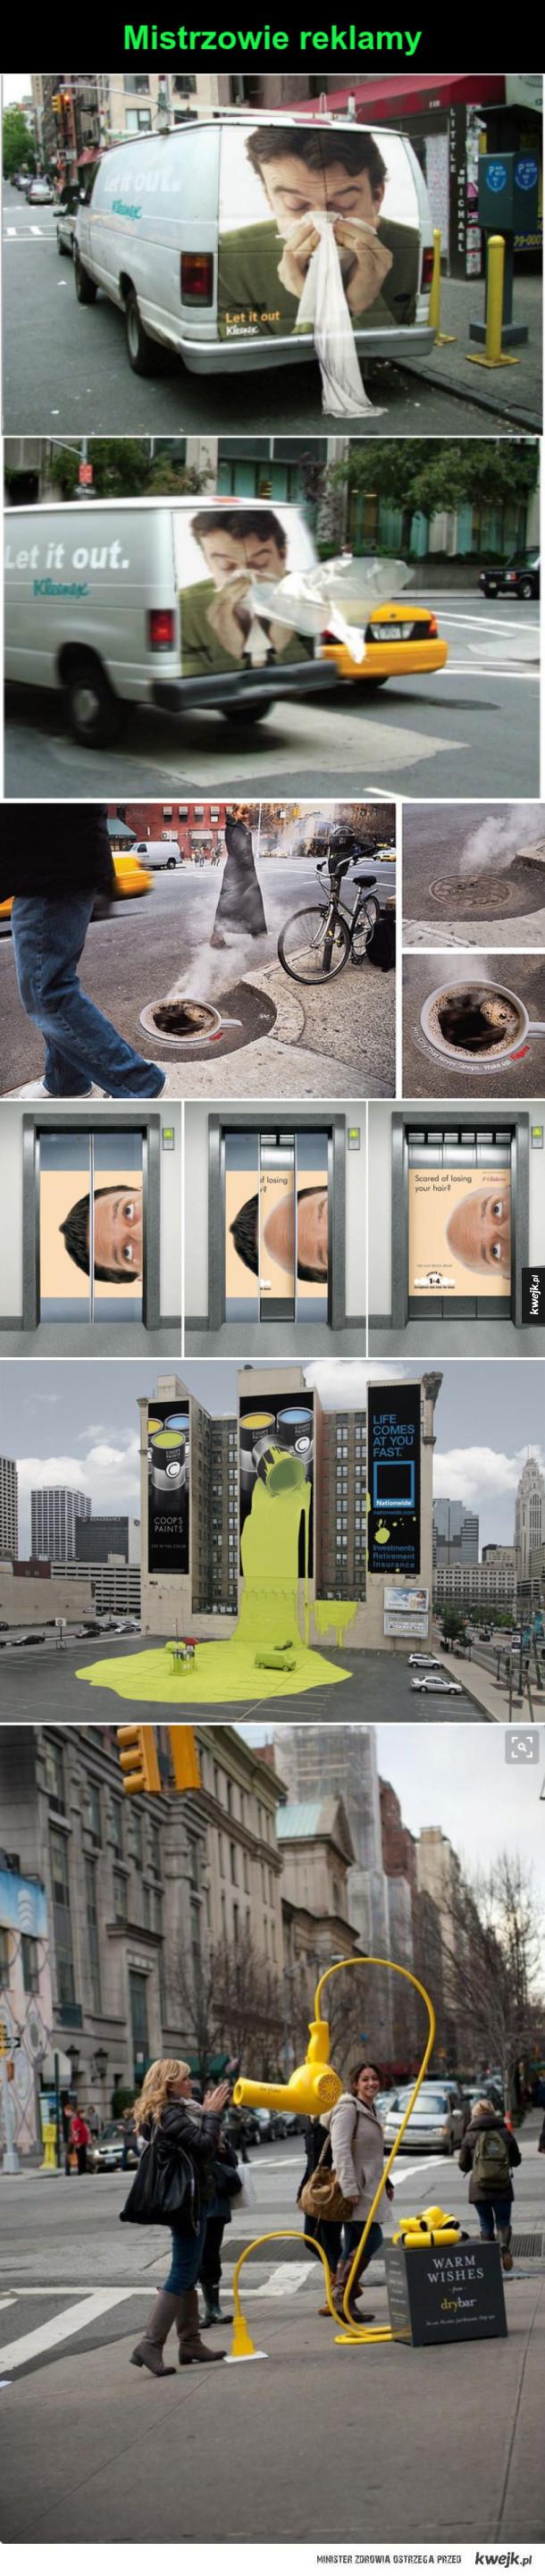 Kreatywna Reklama